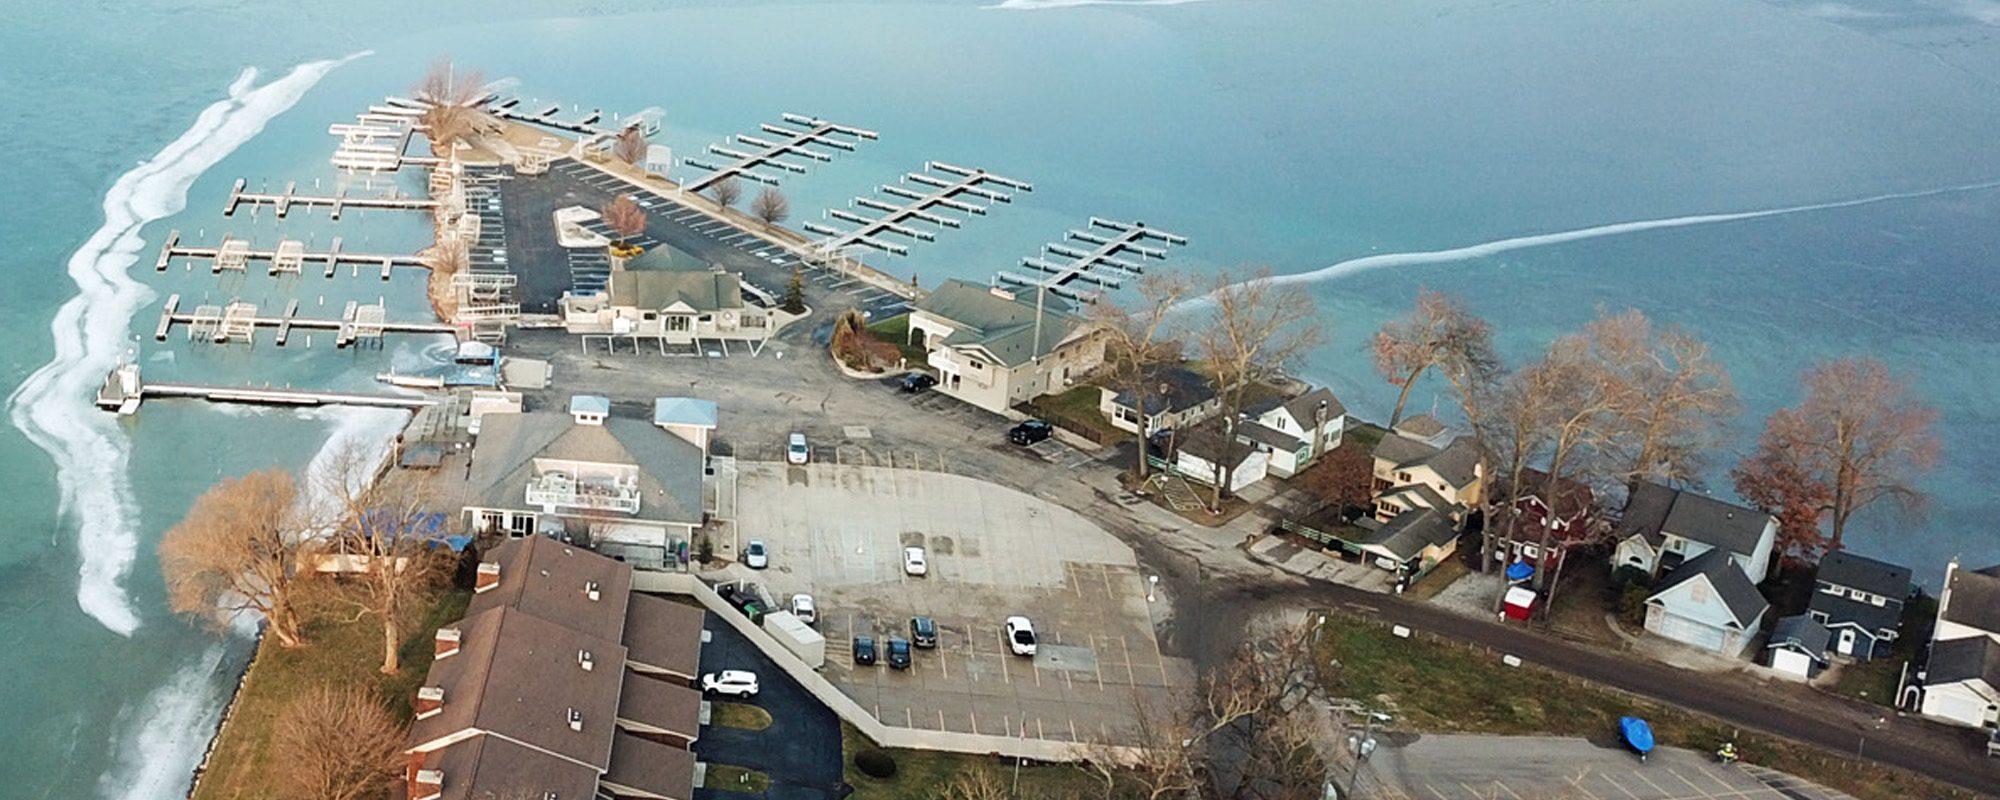 Eagle Point Marina Aerial View